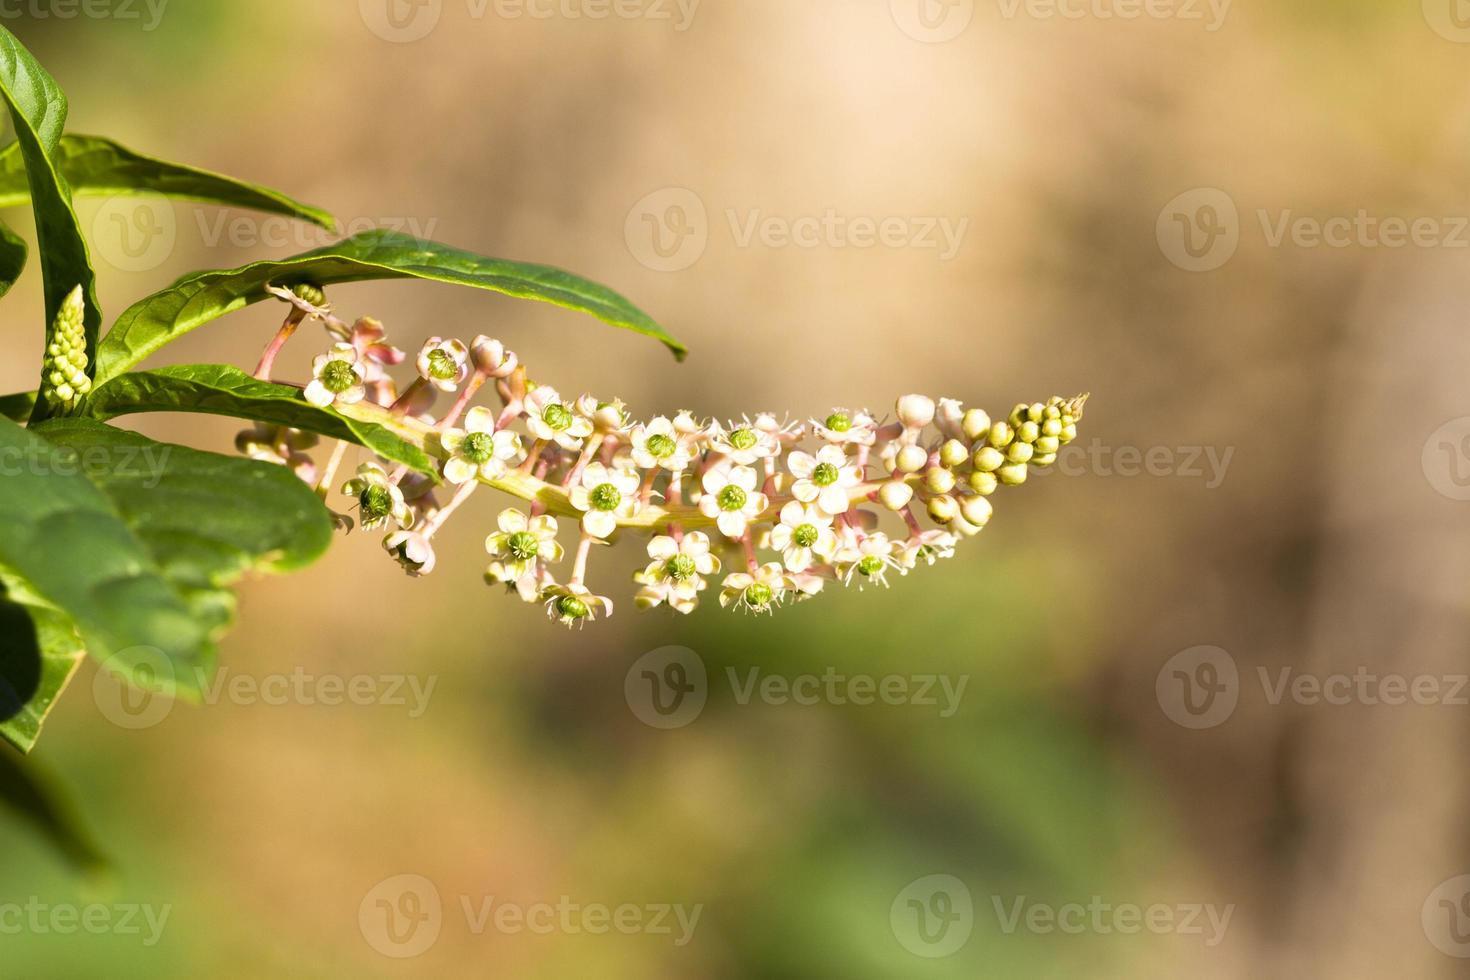 American Pokeweed (Phytolacca americana) photo